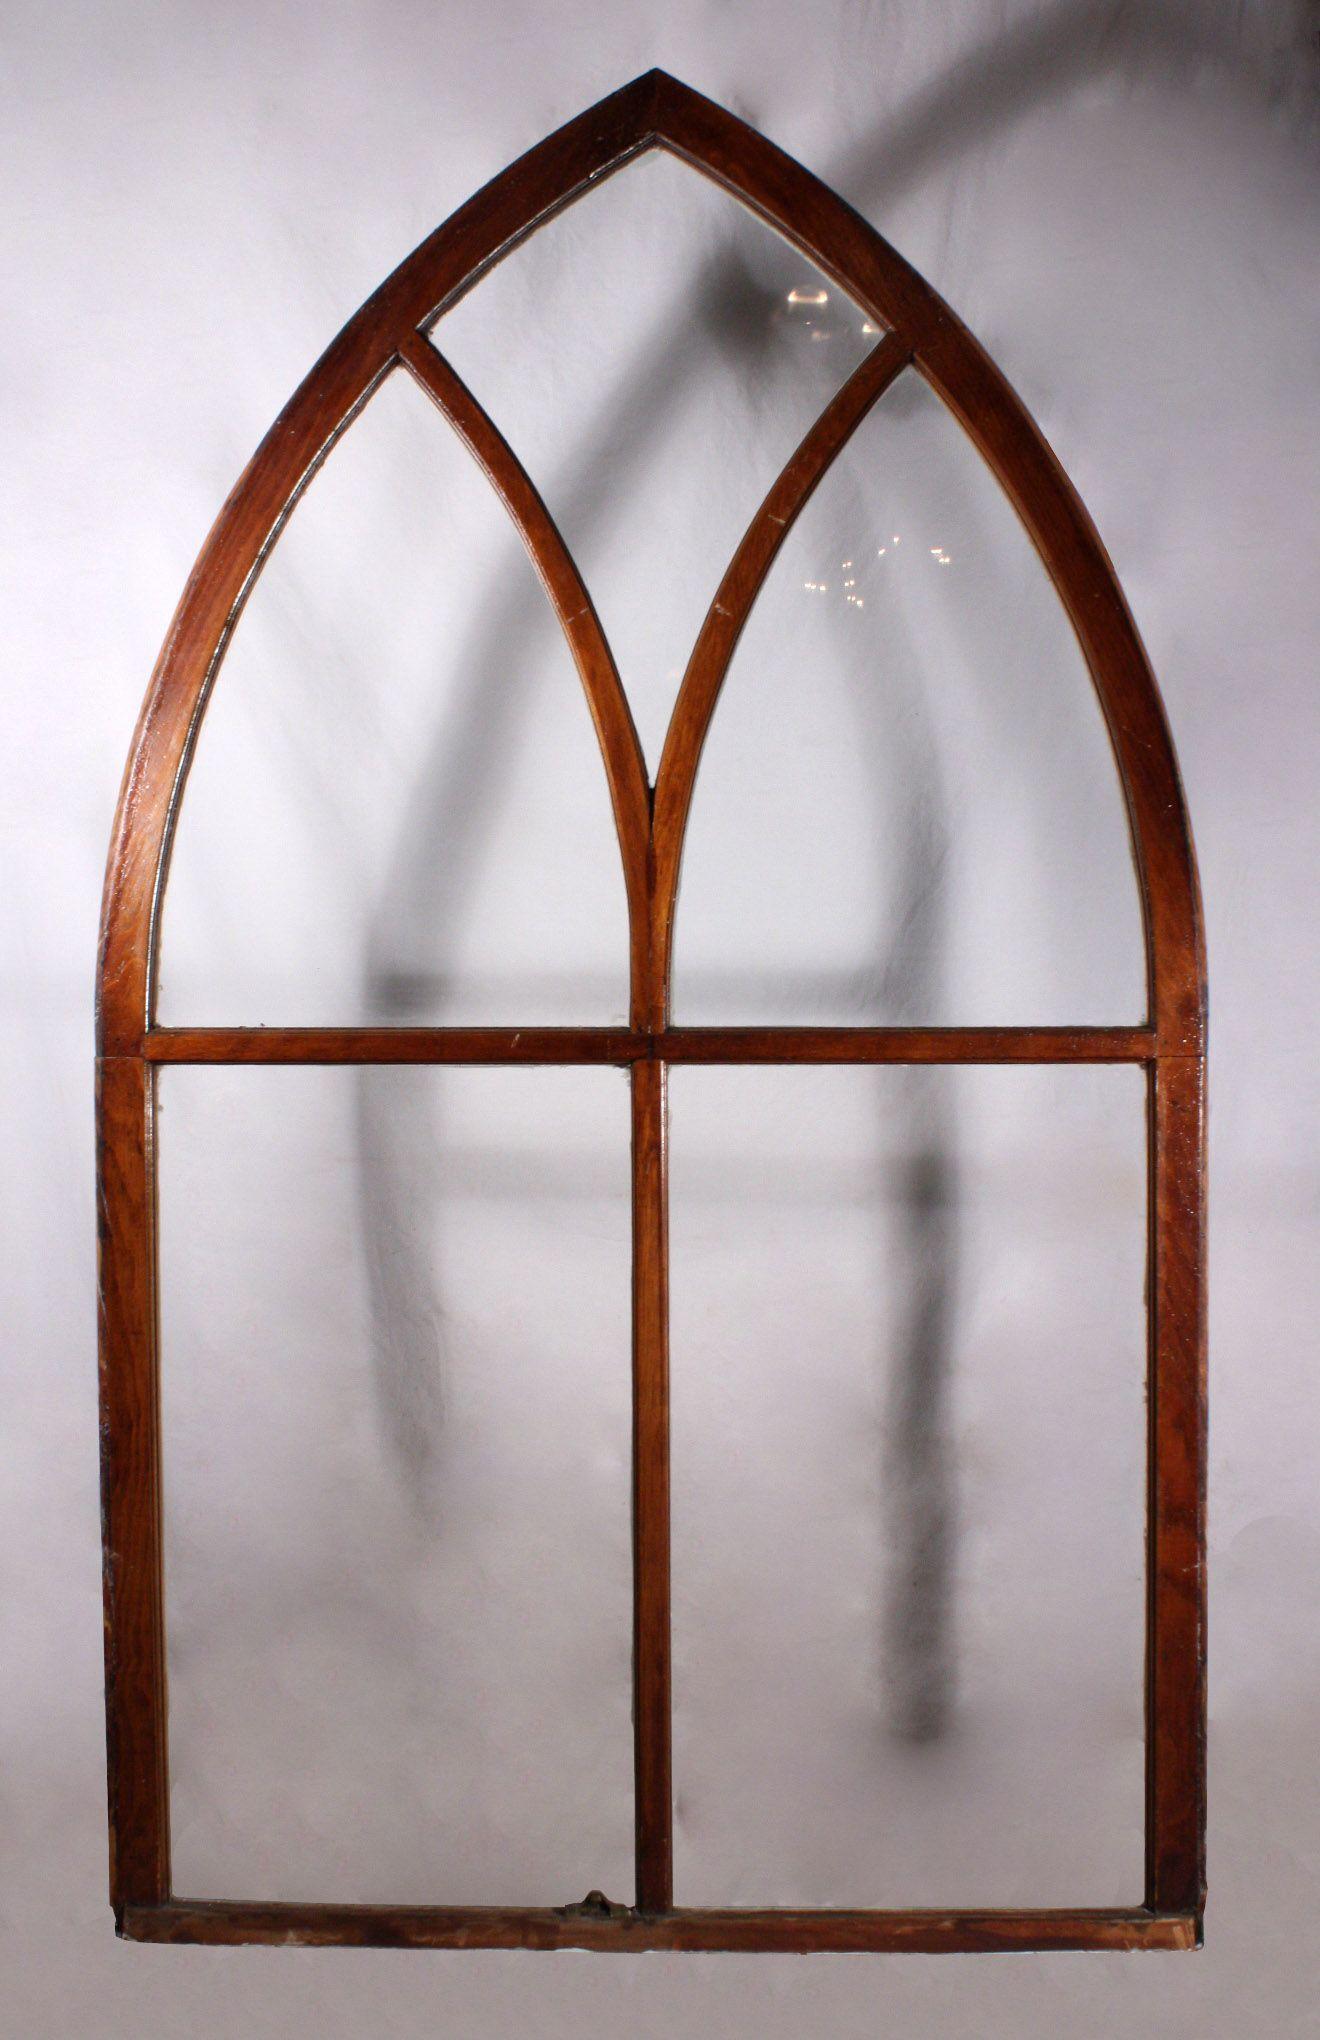 Antique Gothic Windows Antique Windows Gothic Windows Arched